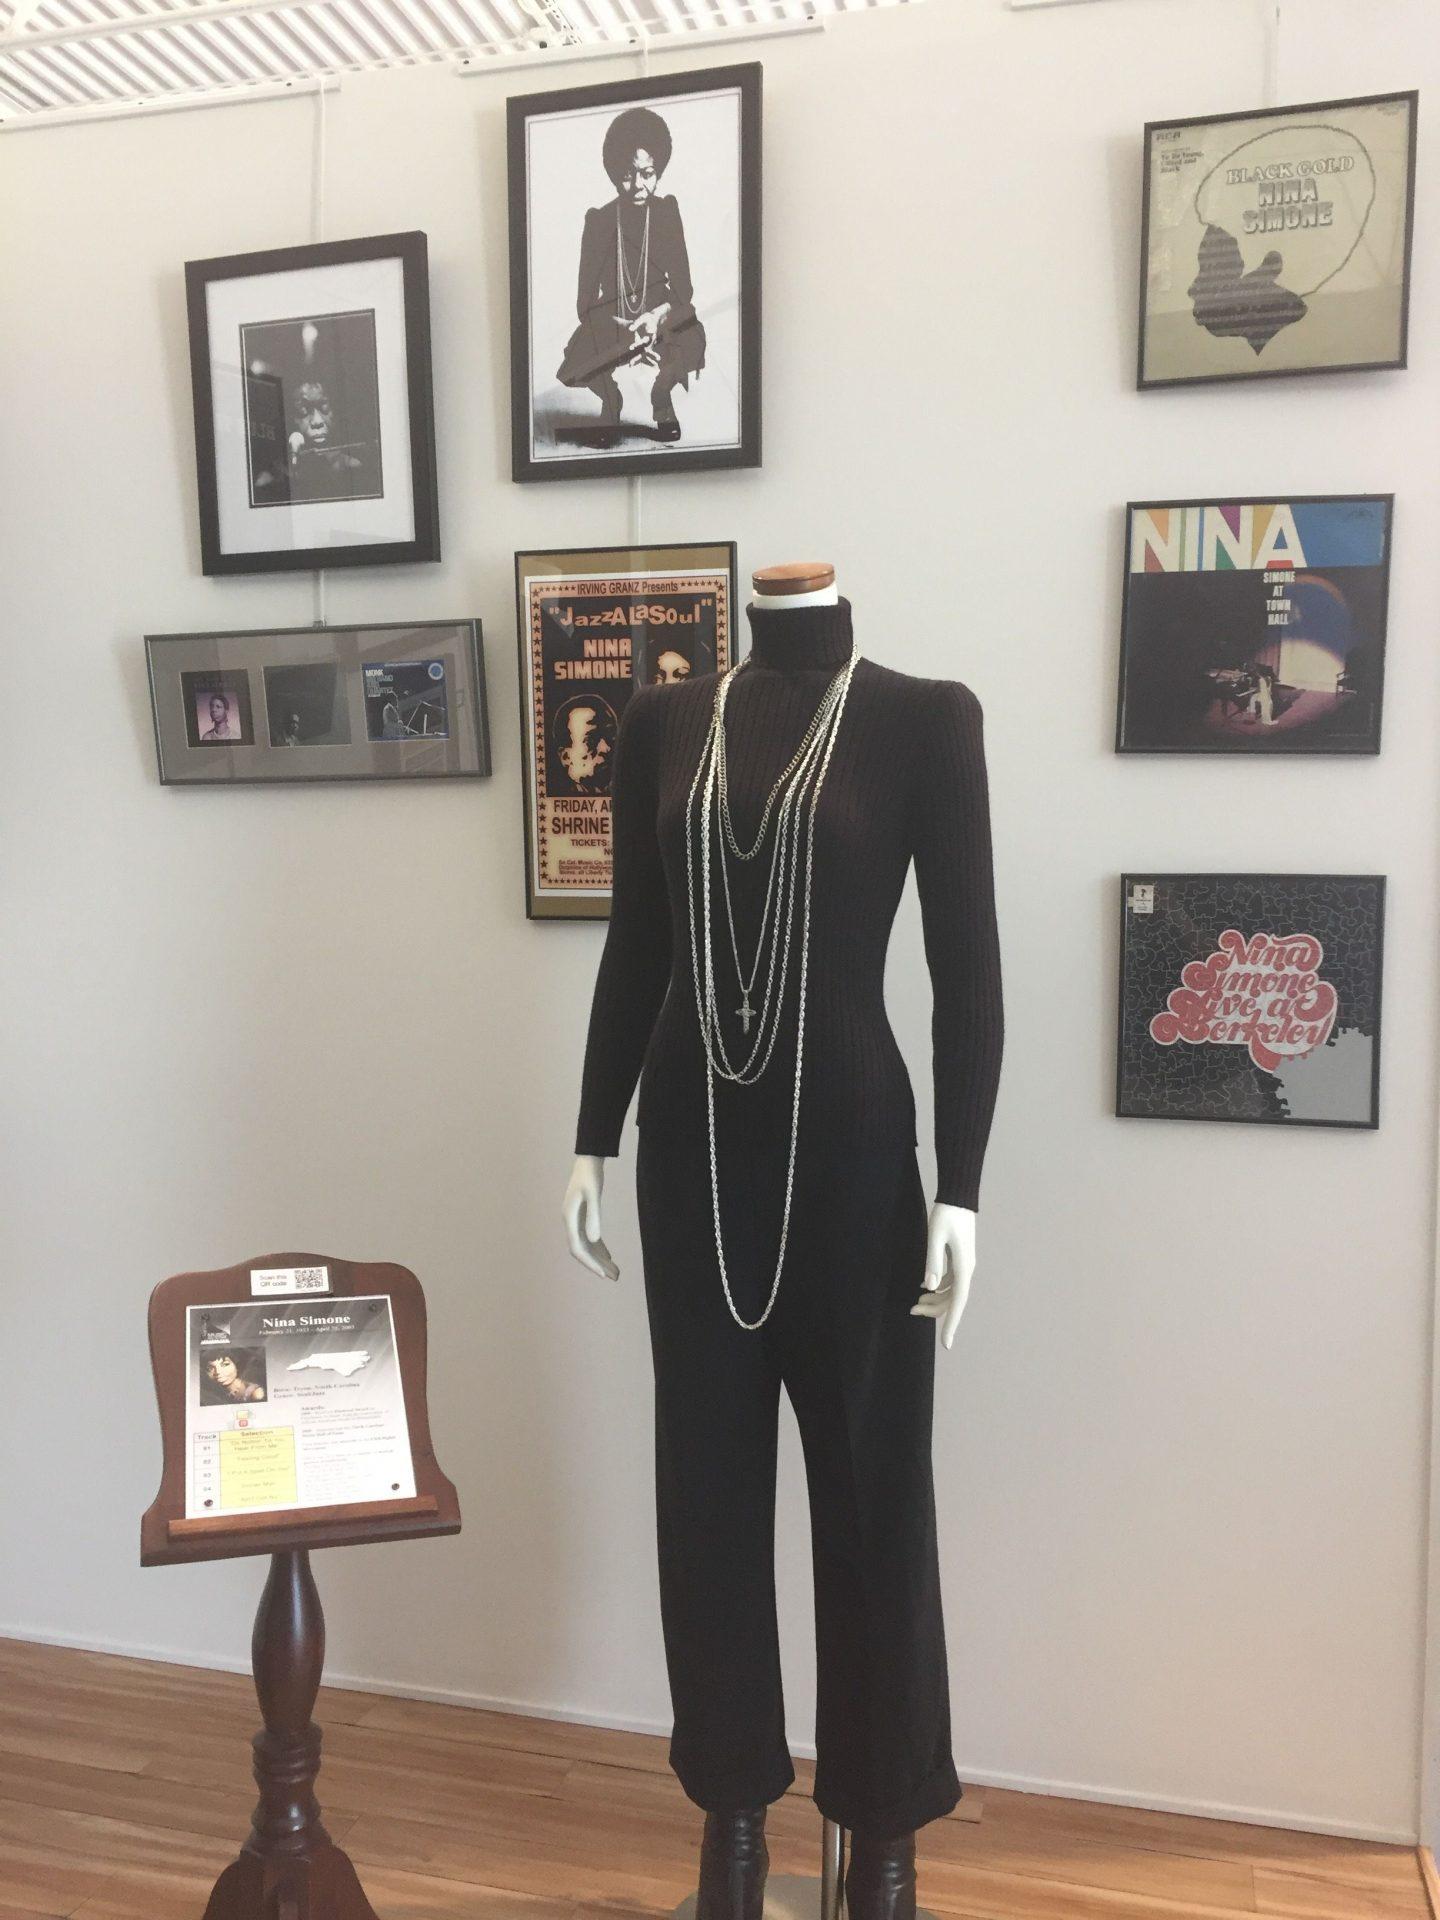 IMG_0670-1440x1920 Nina Simone: A North Carolina Legend and Hall of Famer